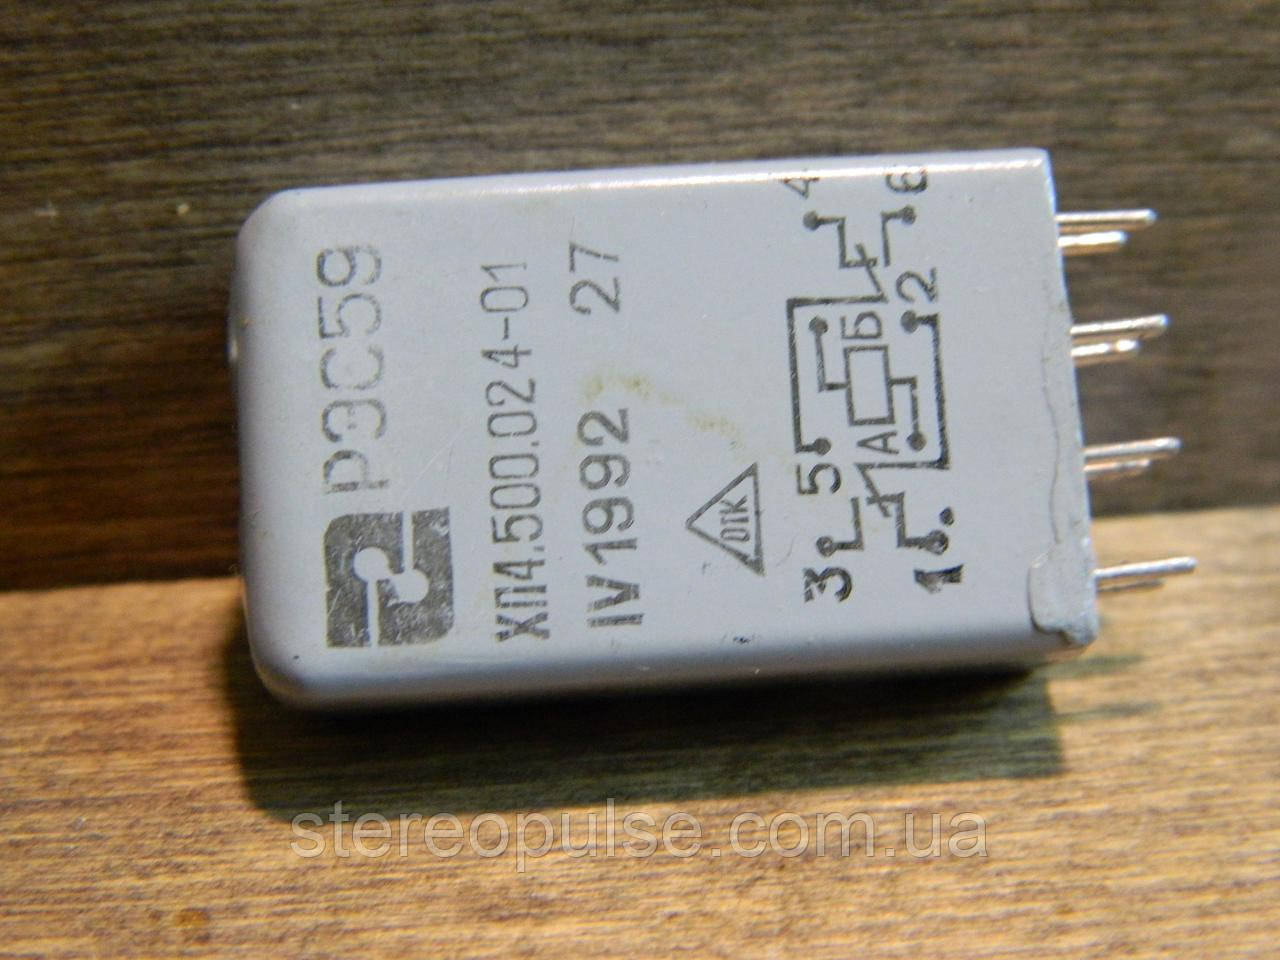 Реле   РЭС59   024.01      2.5 В